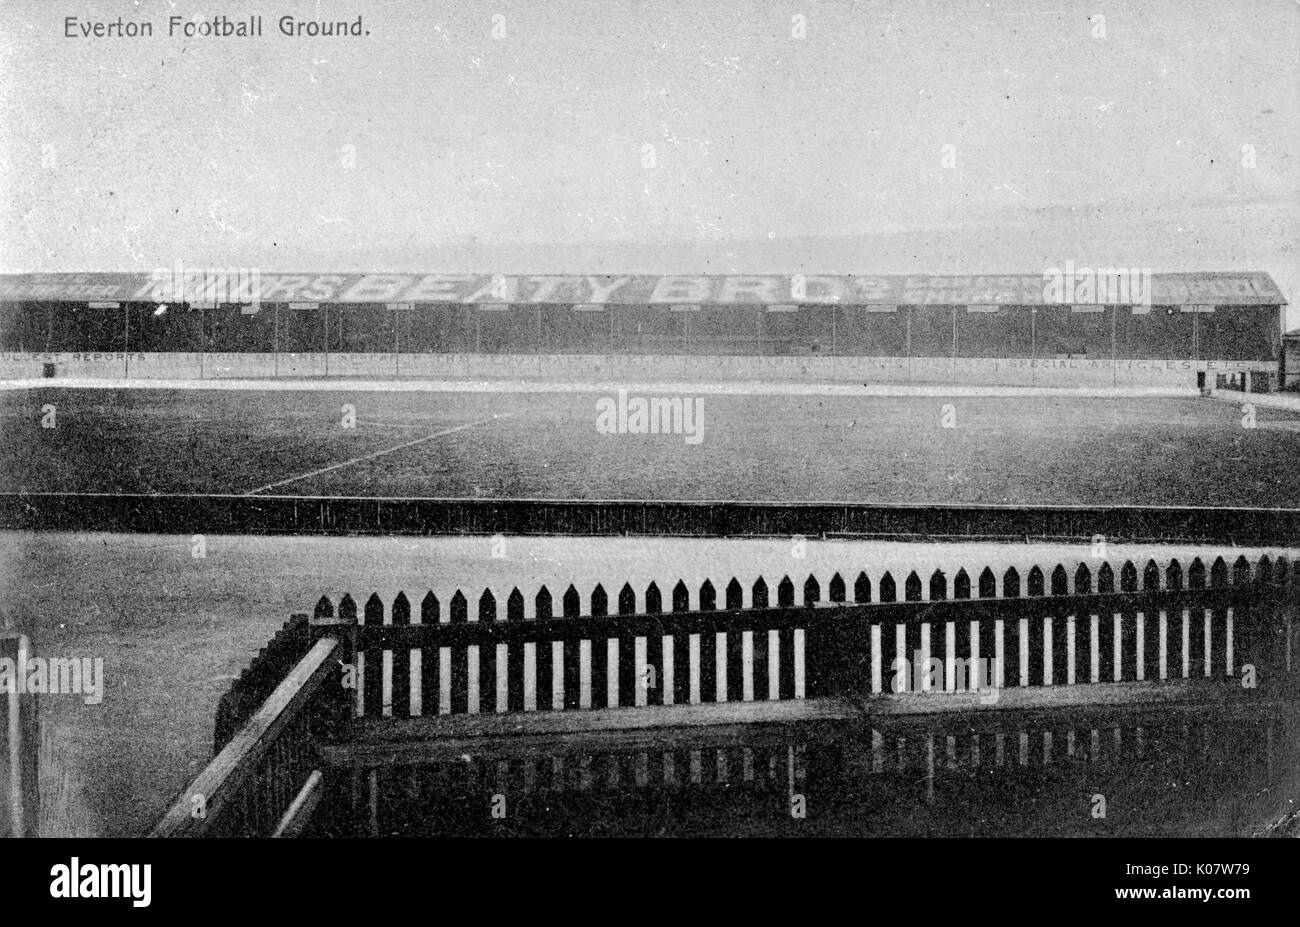 Terrain de football Everton, Liverpool. Date: vers 1910 Banque D'Images